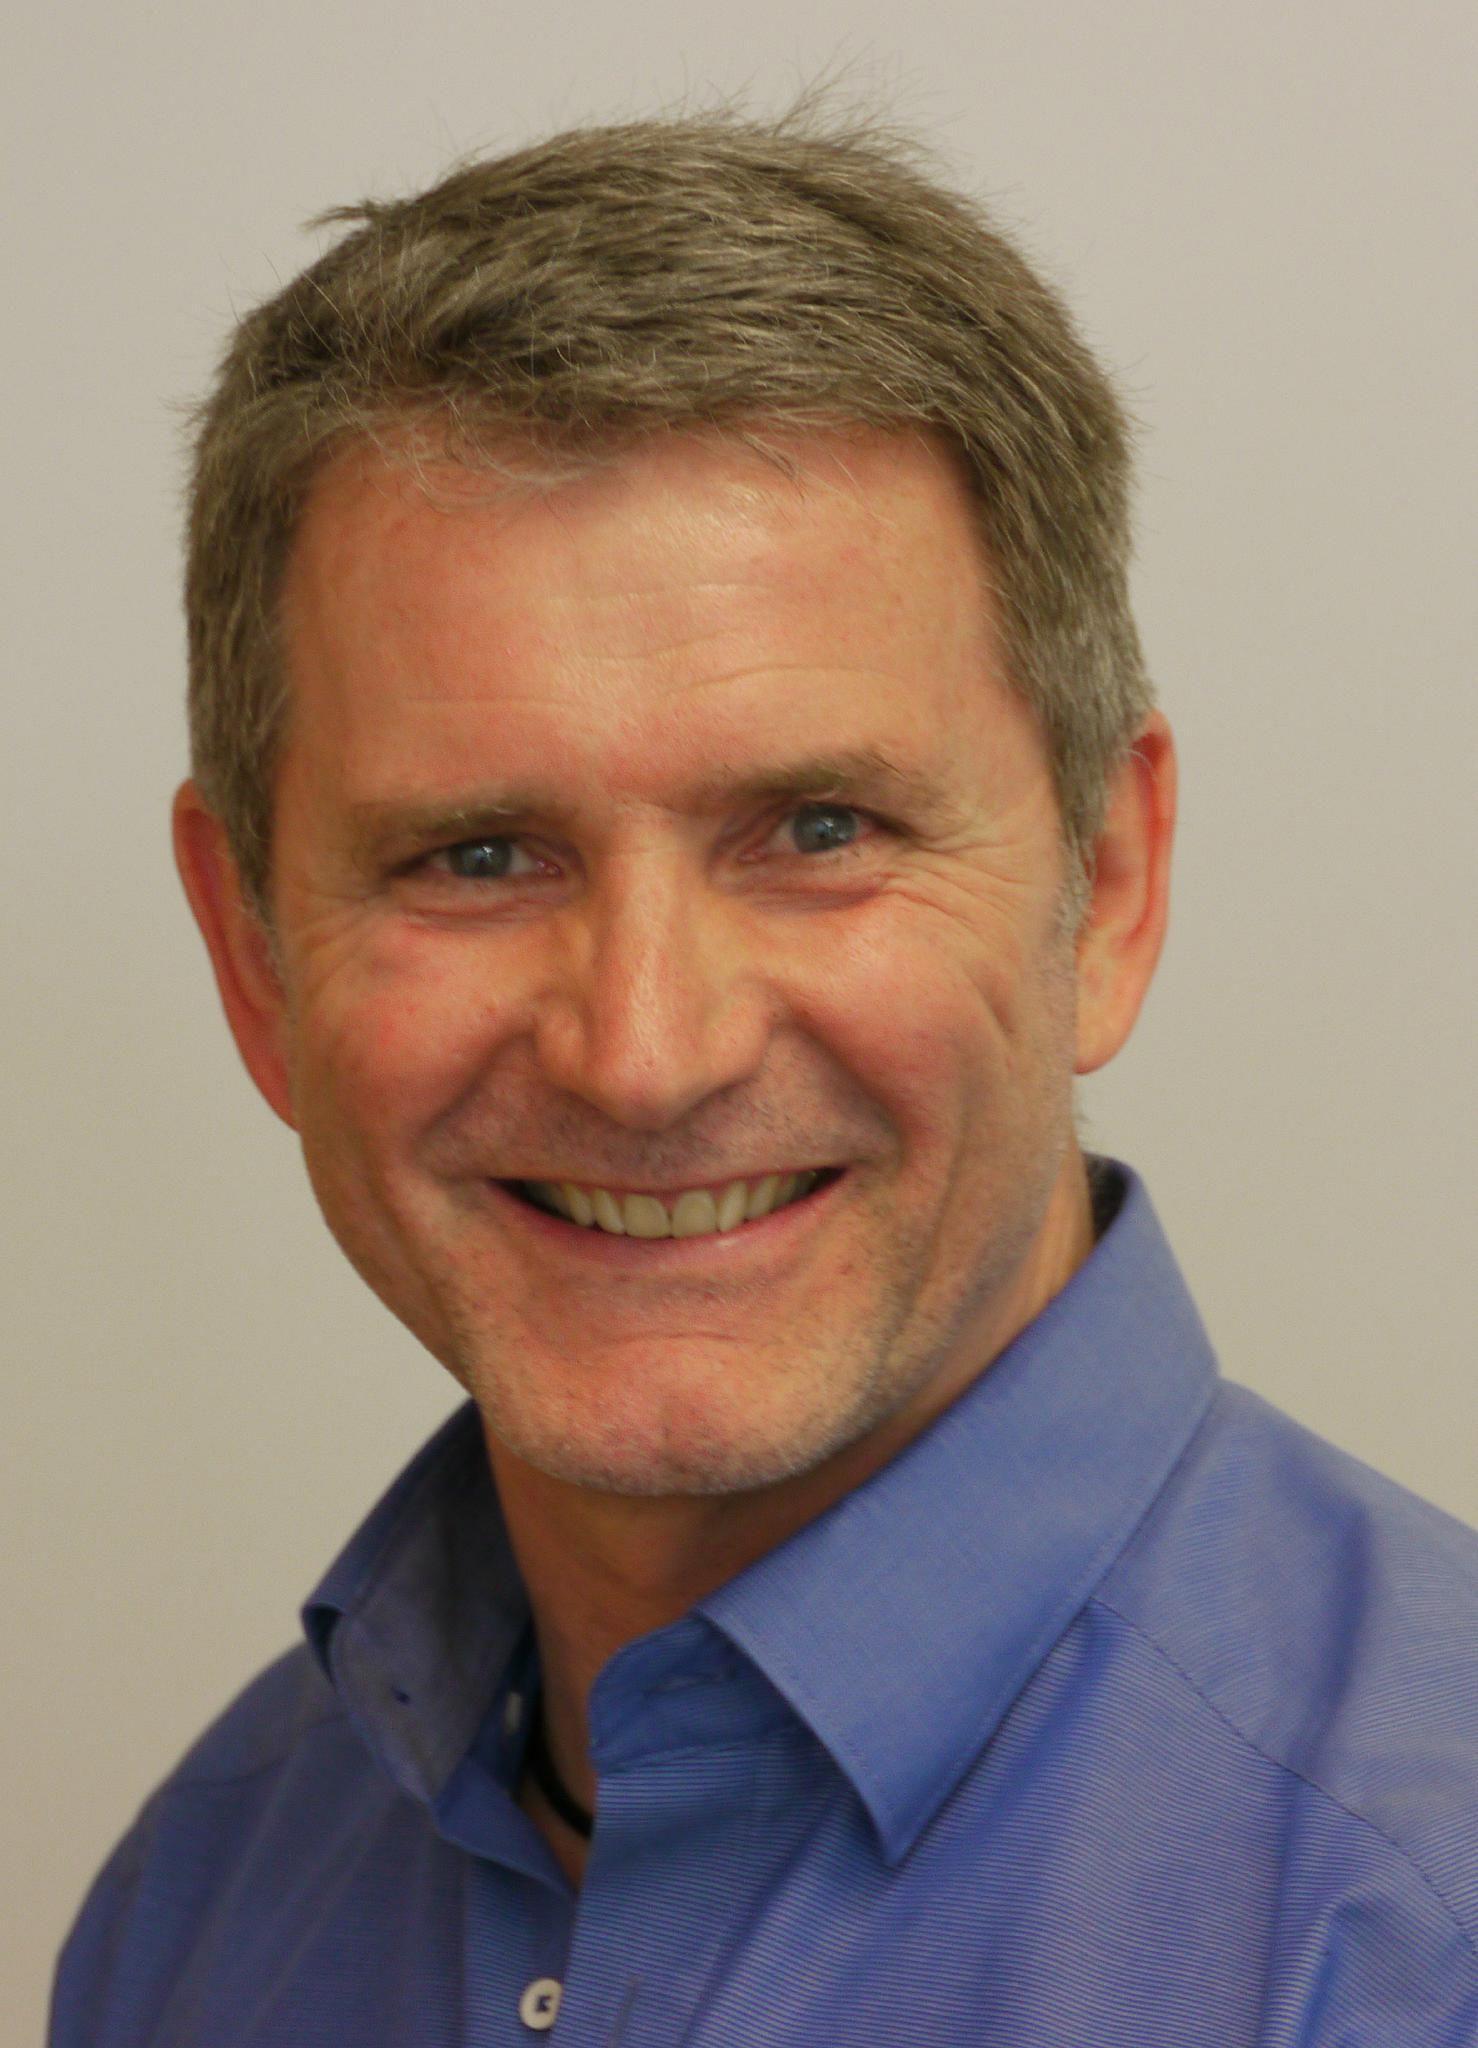 Udo Keuter